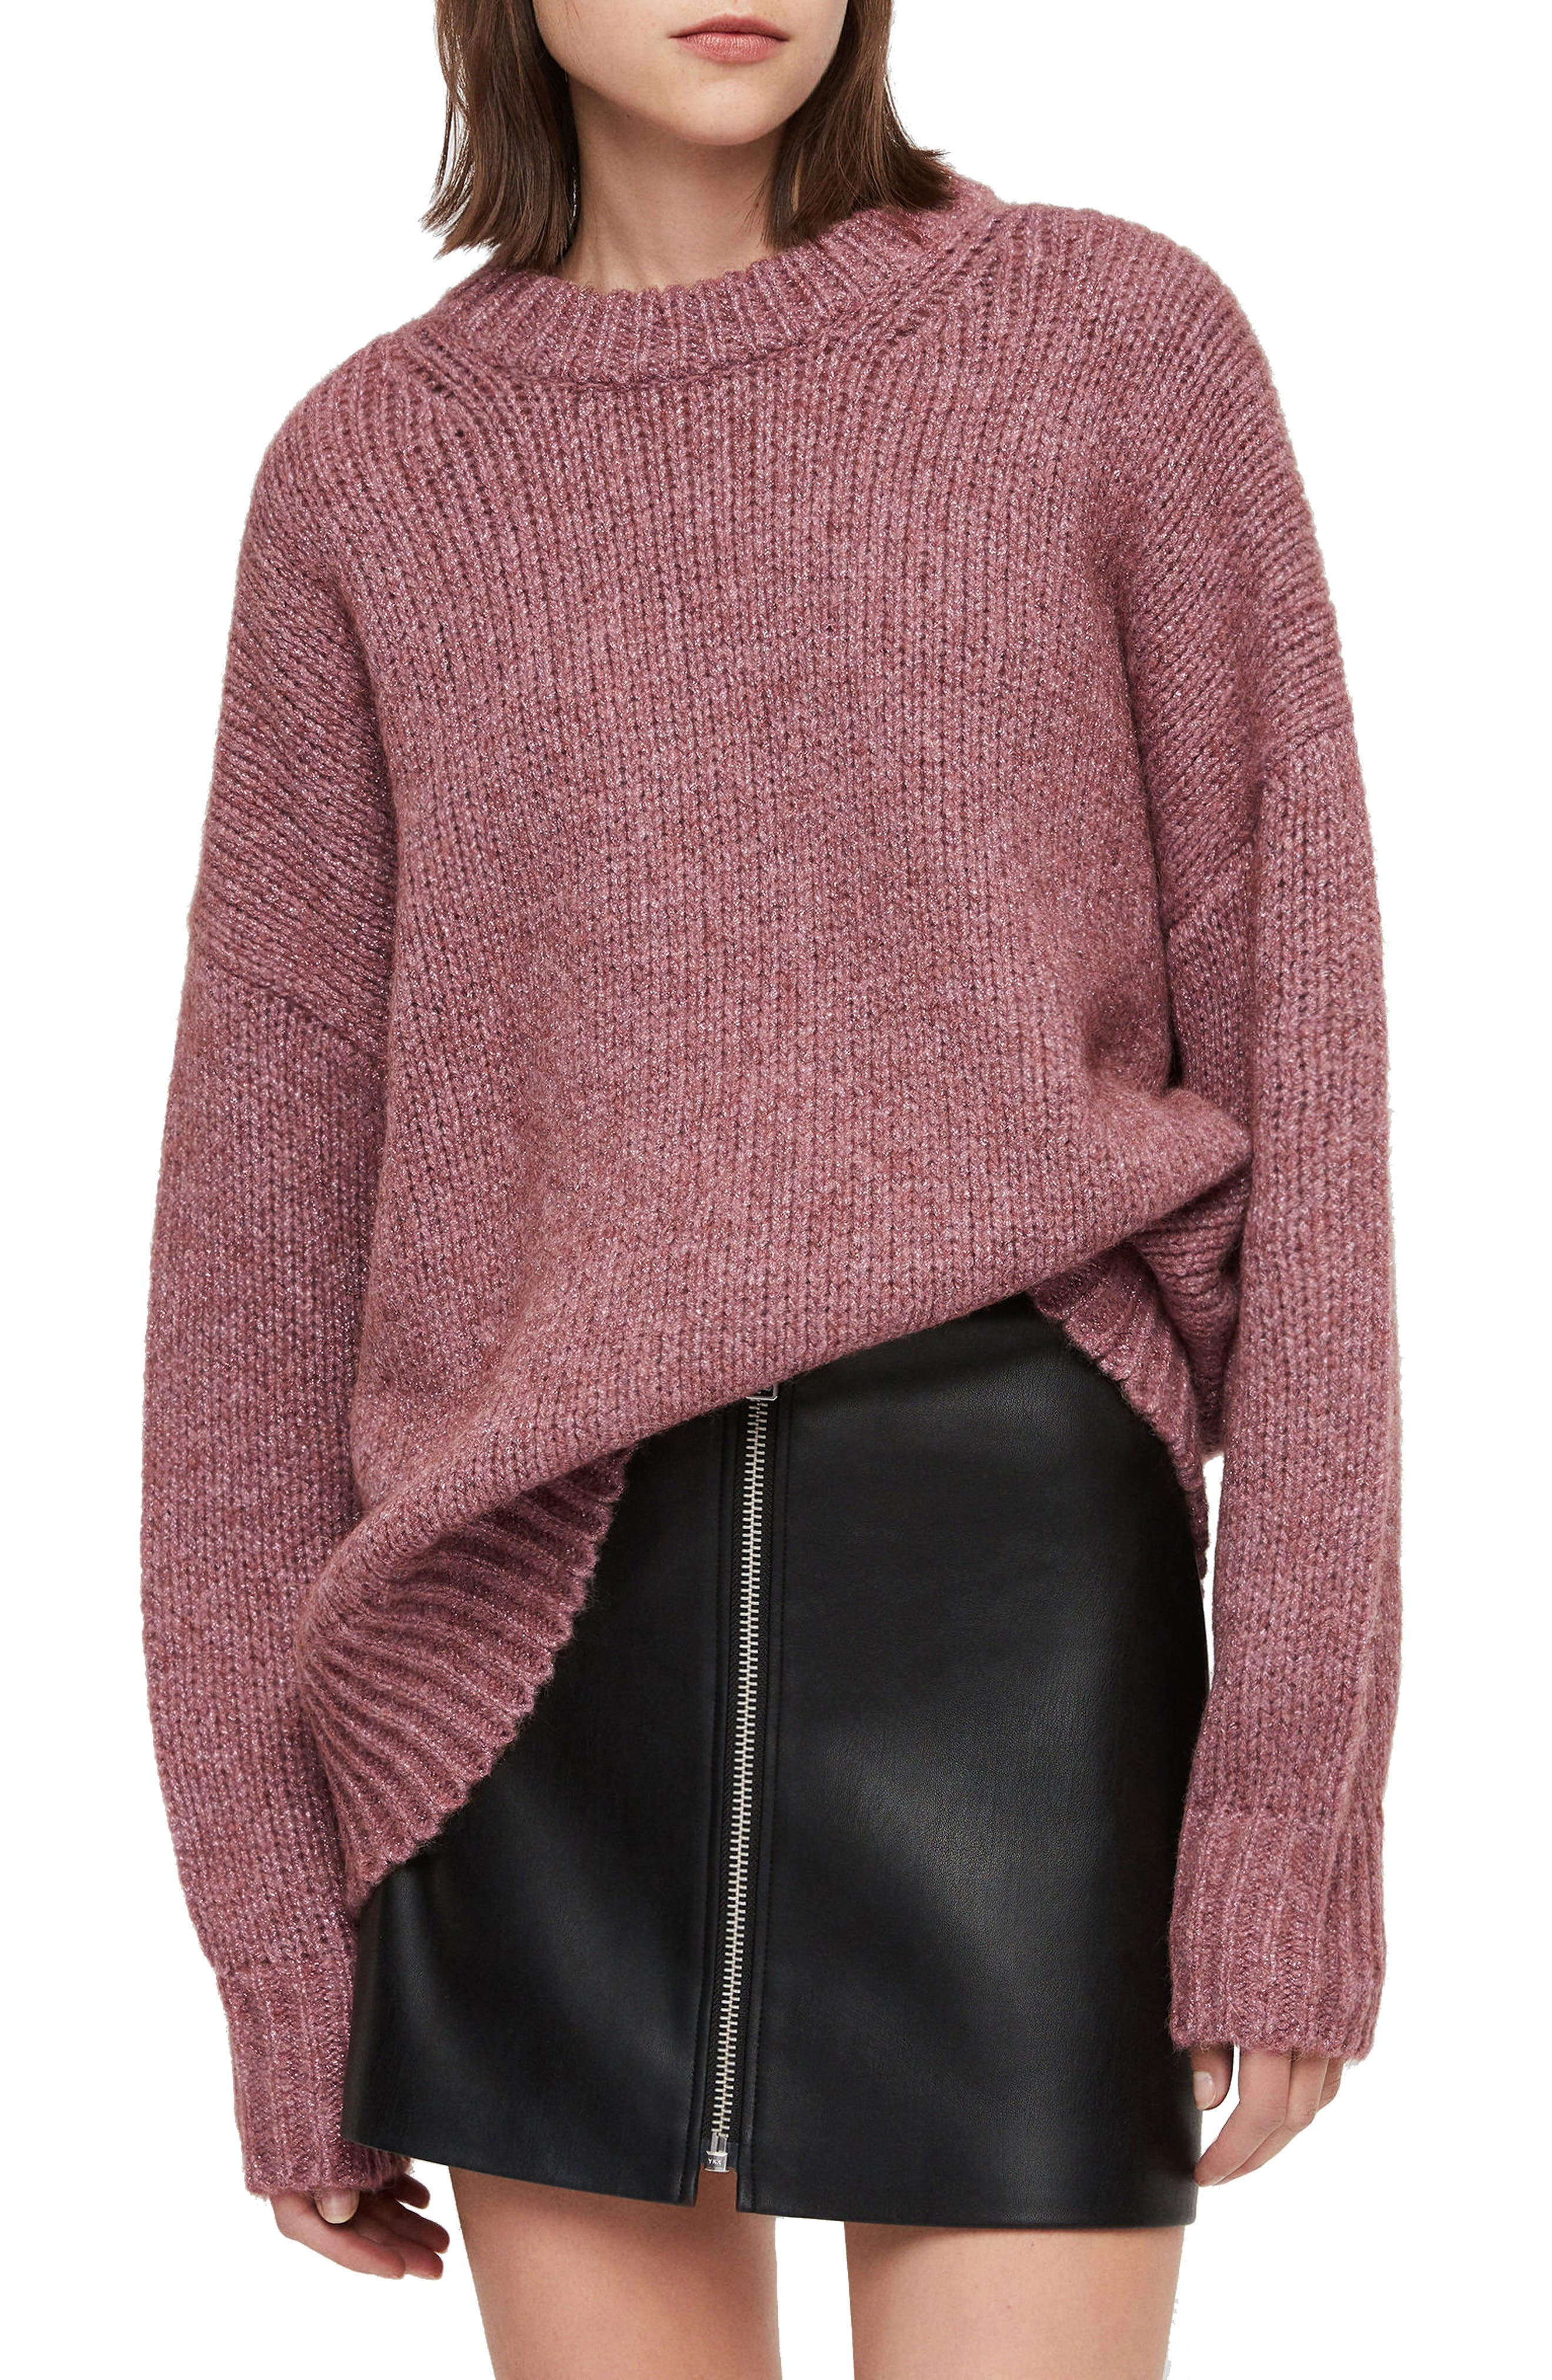 ALLSAINTS, Gemini Metallic Knit Sweater, Main thumbnail 1, color, 653